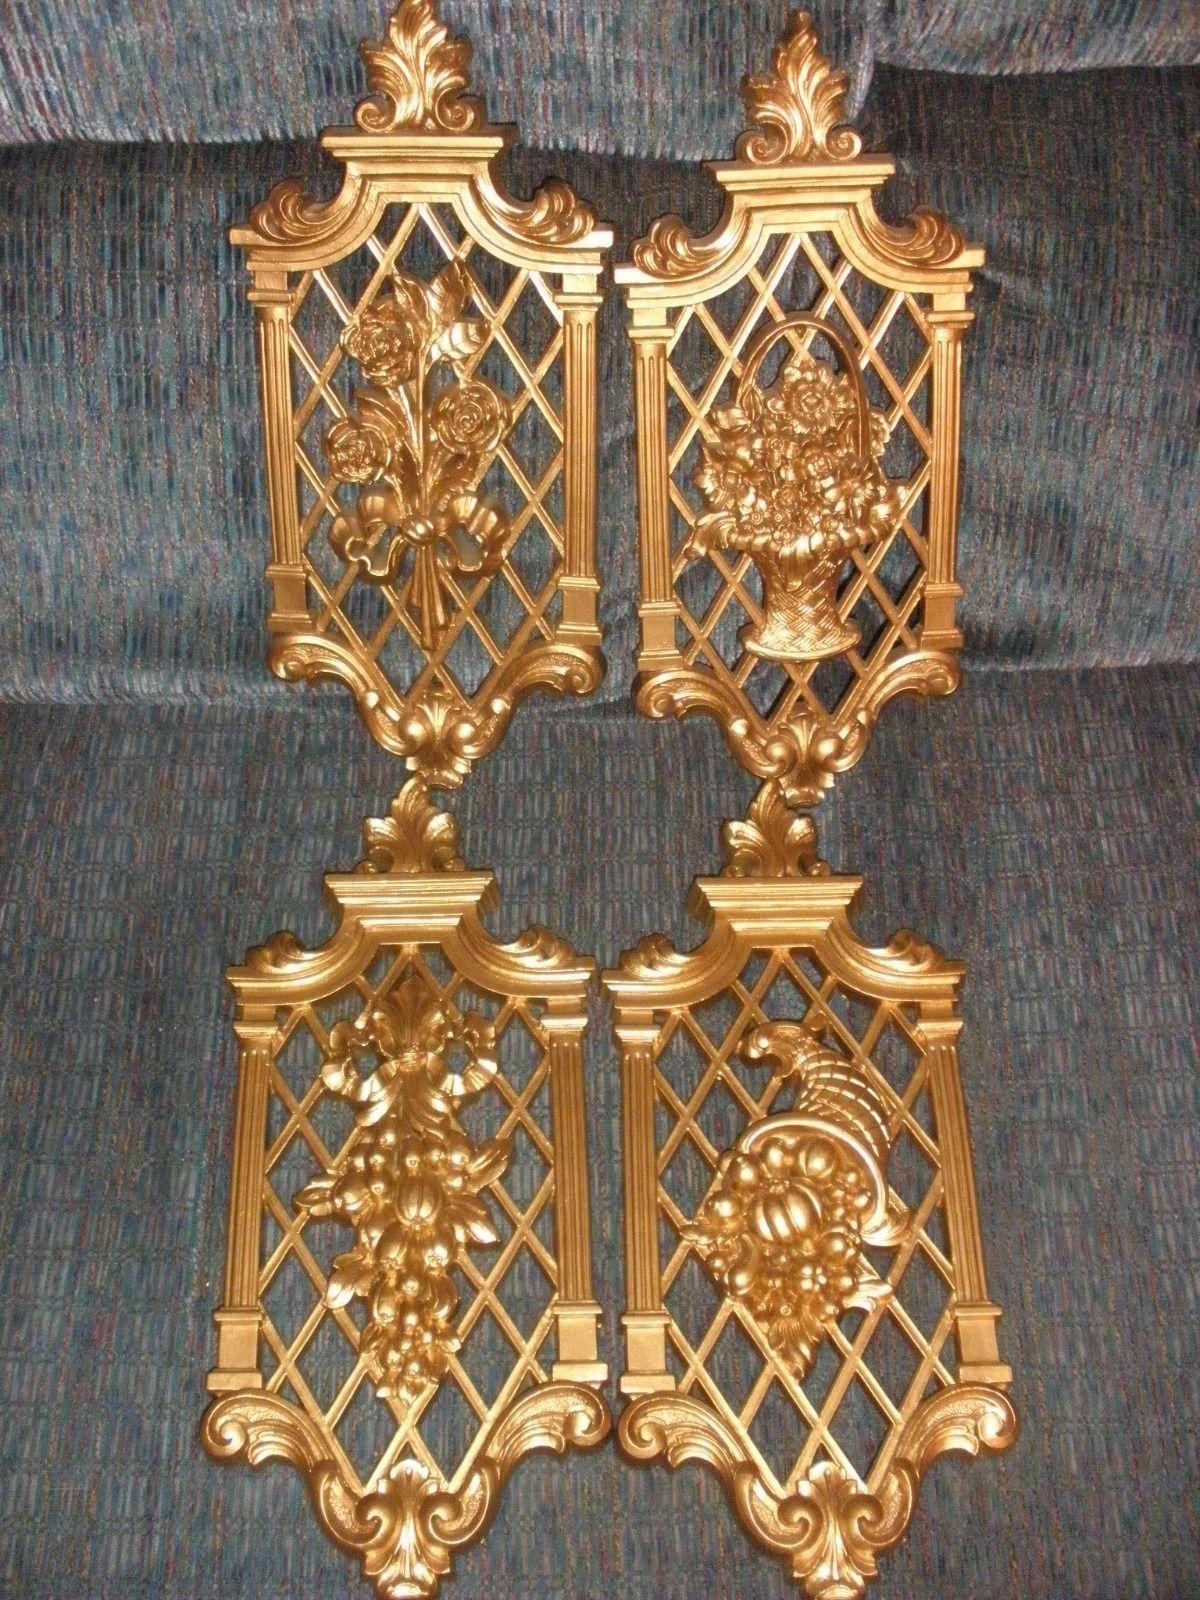 Homco set of seasonal plaques in gold set of 4 vintage - $19.36